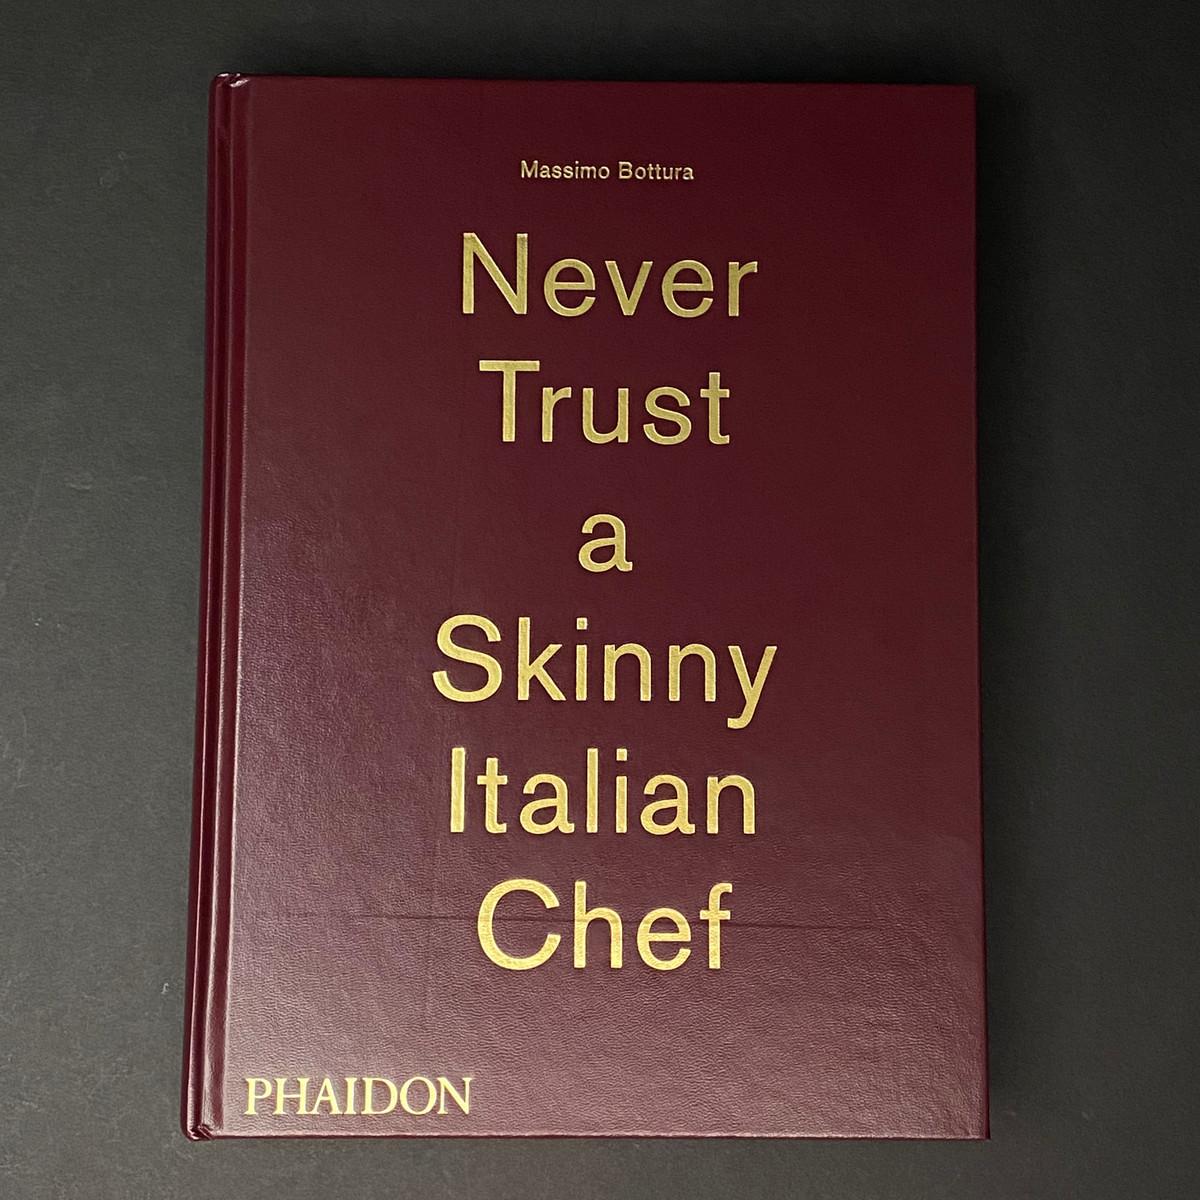 Never Trust a Skinny Italian Chef | Massimo Bottura